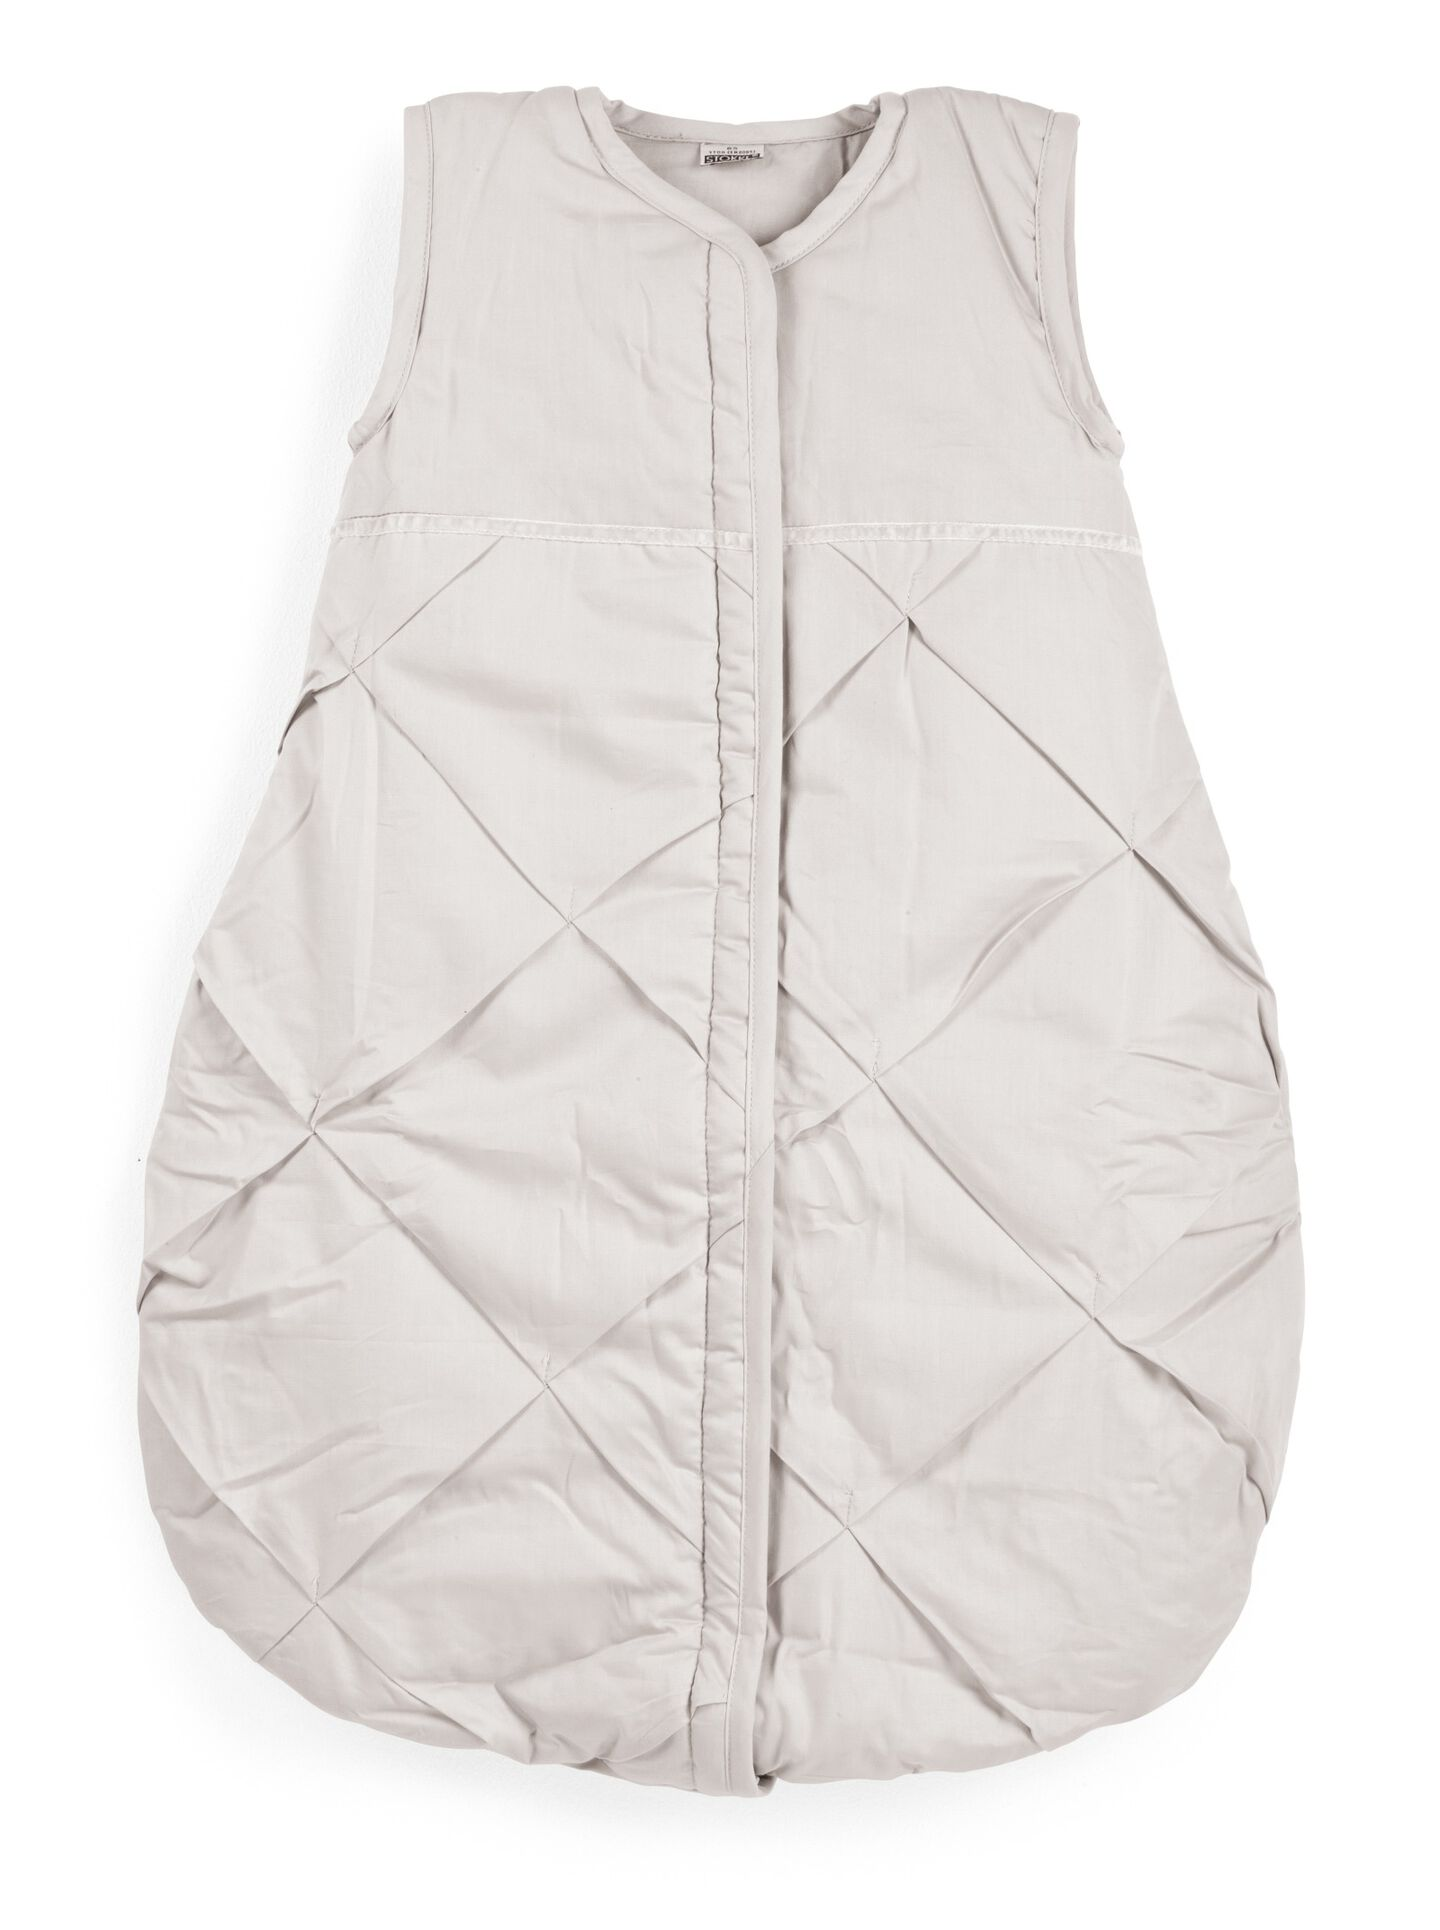 Sleeping Bag 65cm, Classic Beige